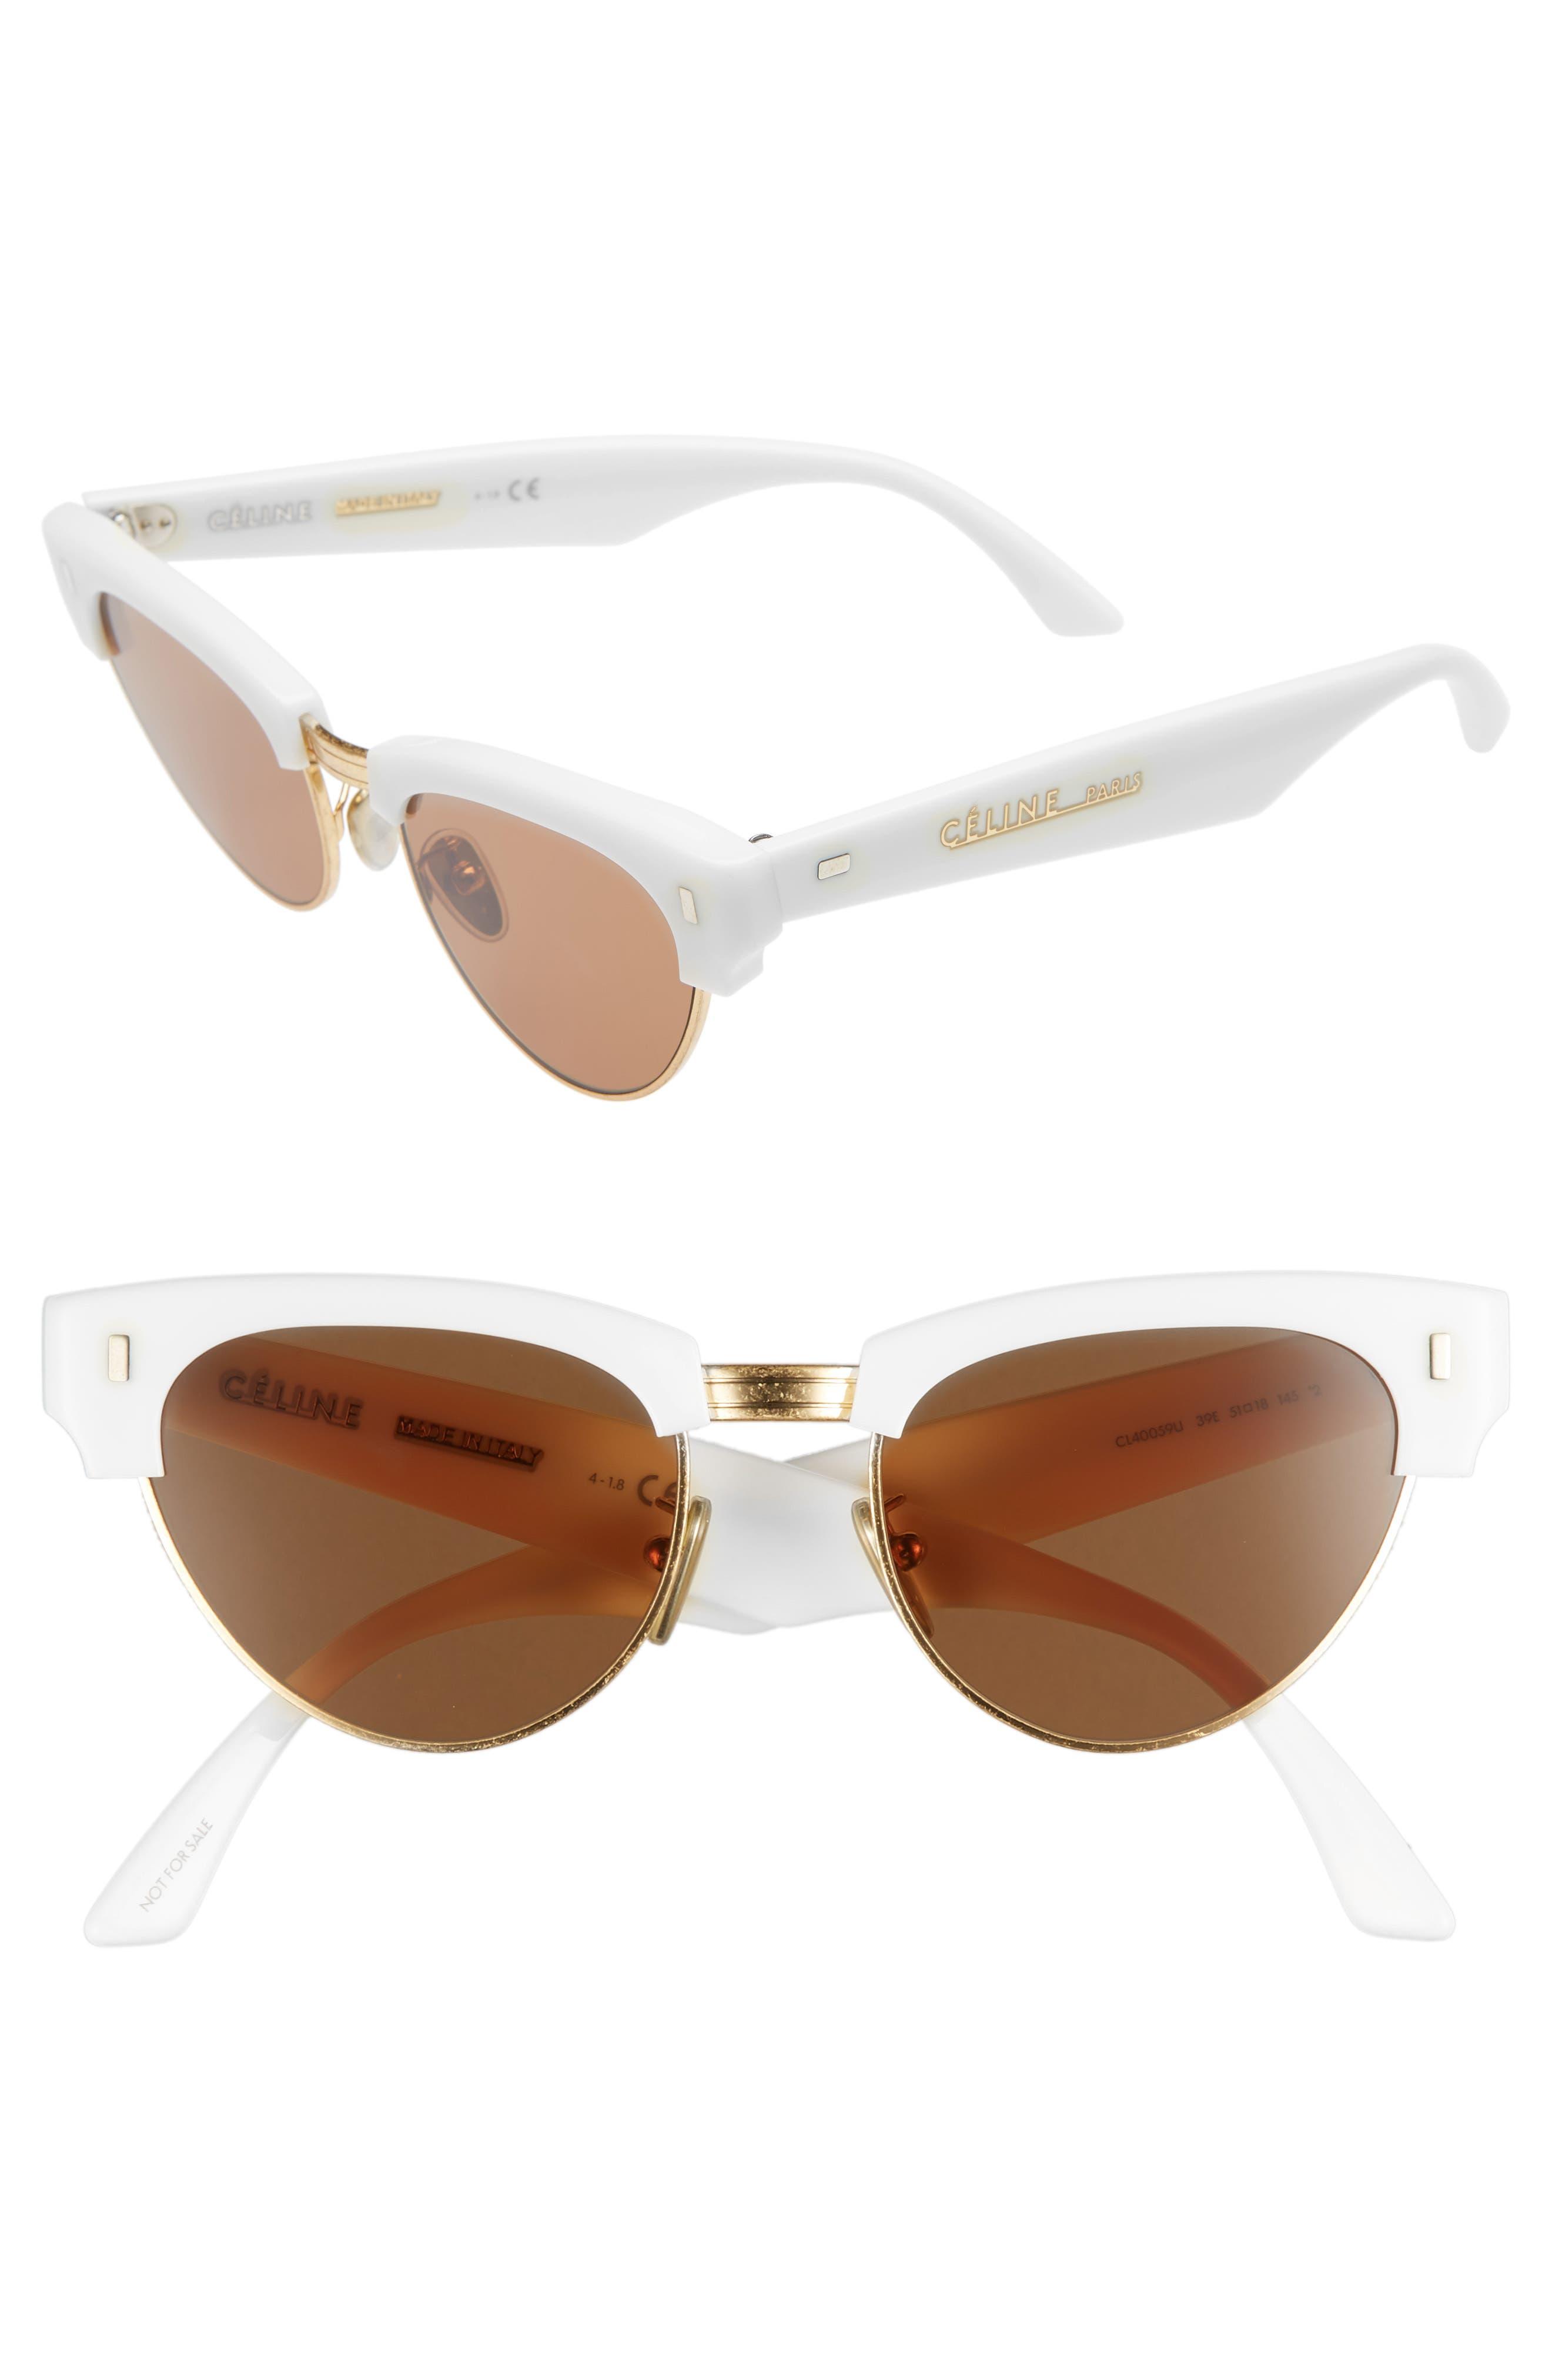 51Mm Modified Cat Eye Sunglasses - Shiny Ivory